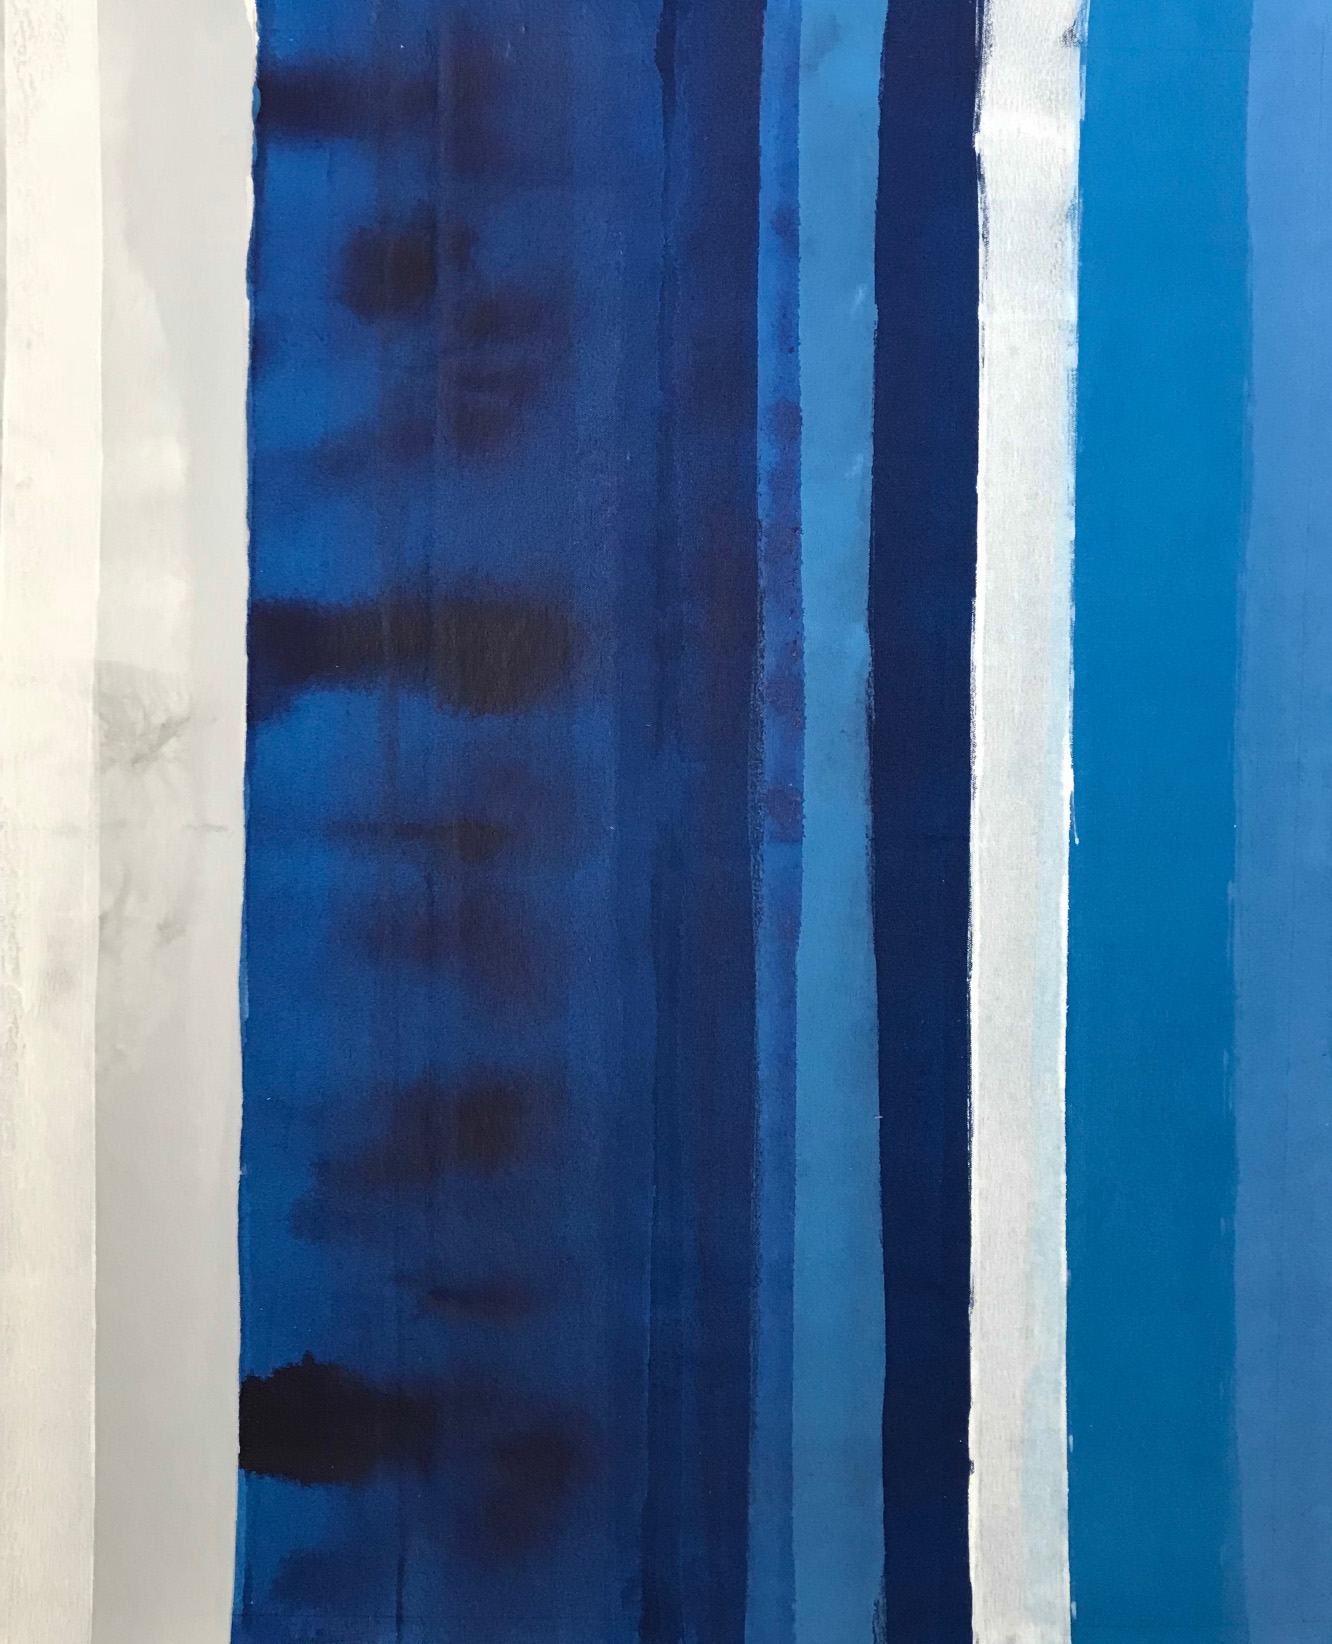 Anse de Petit Jean, Acrylic on canvas, 35 x 28 x 1.75 in.